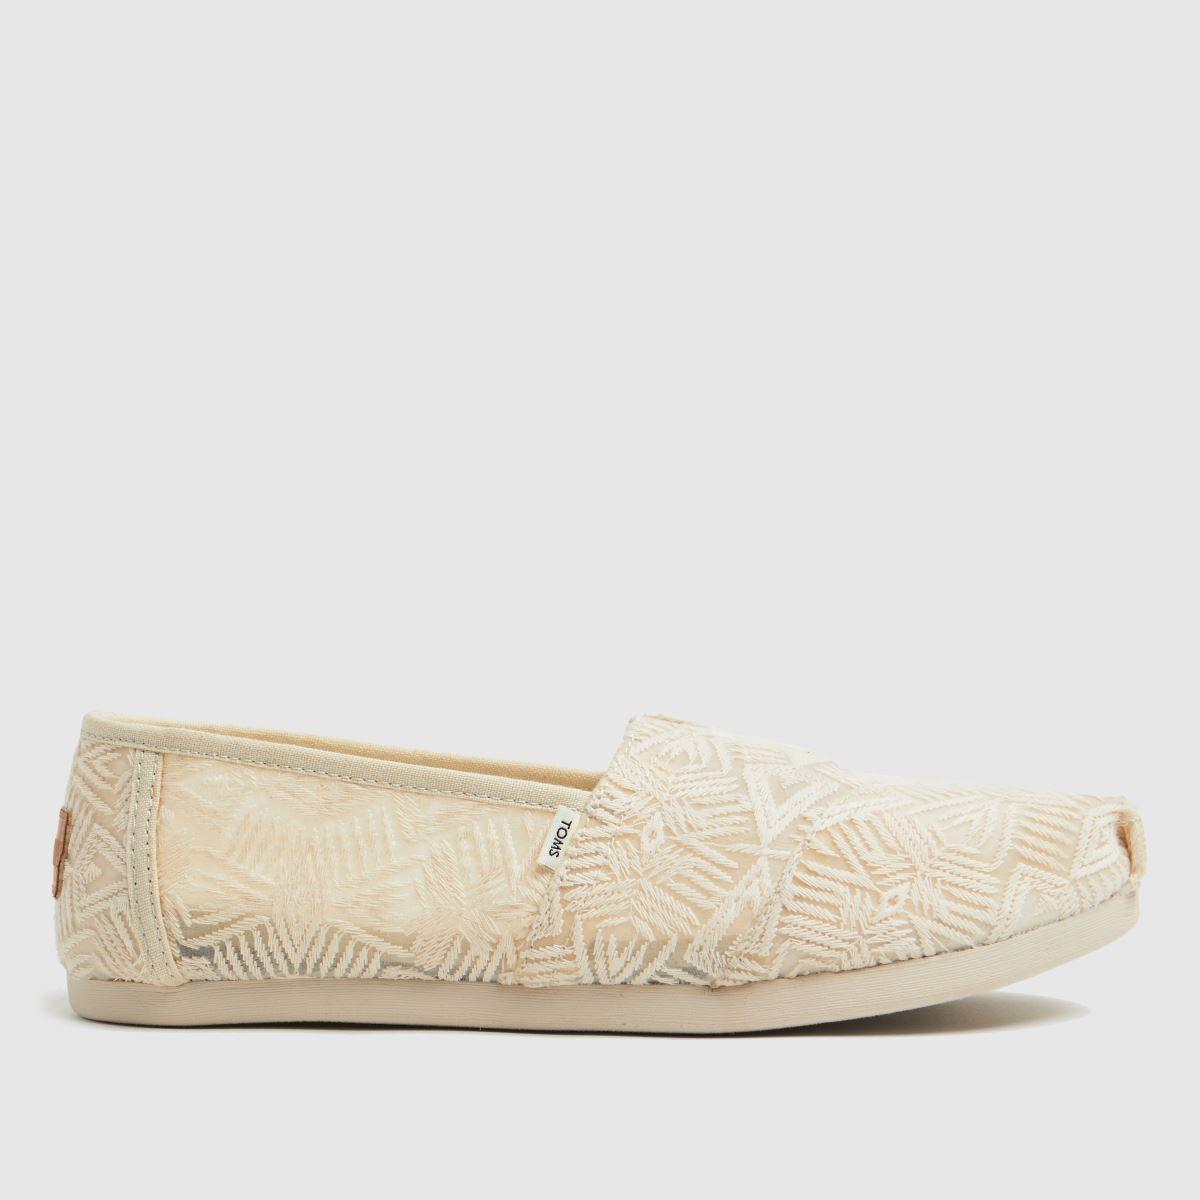 TOMS Natural Alpargata 3.0 Vegan Flat Shoes